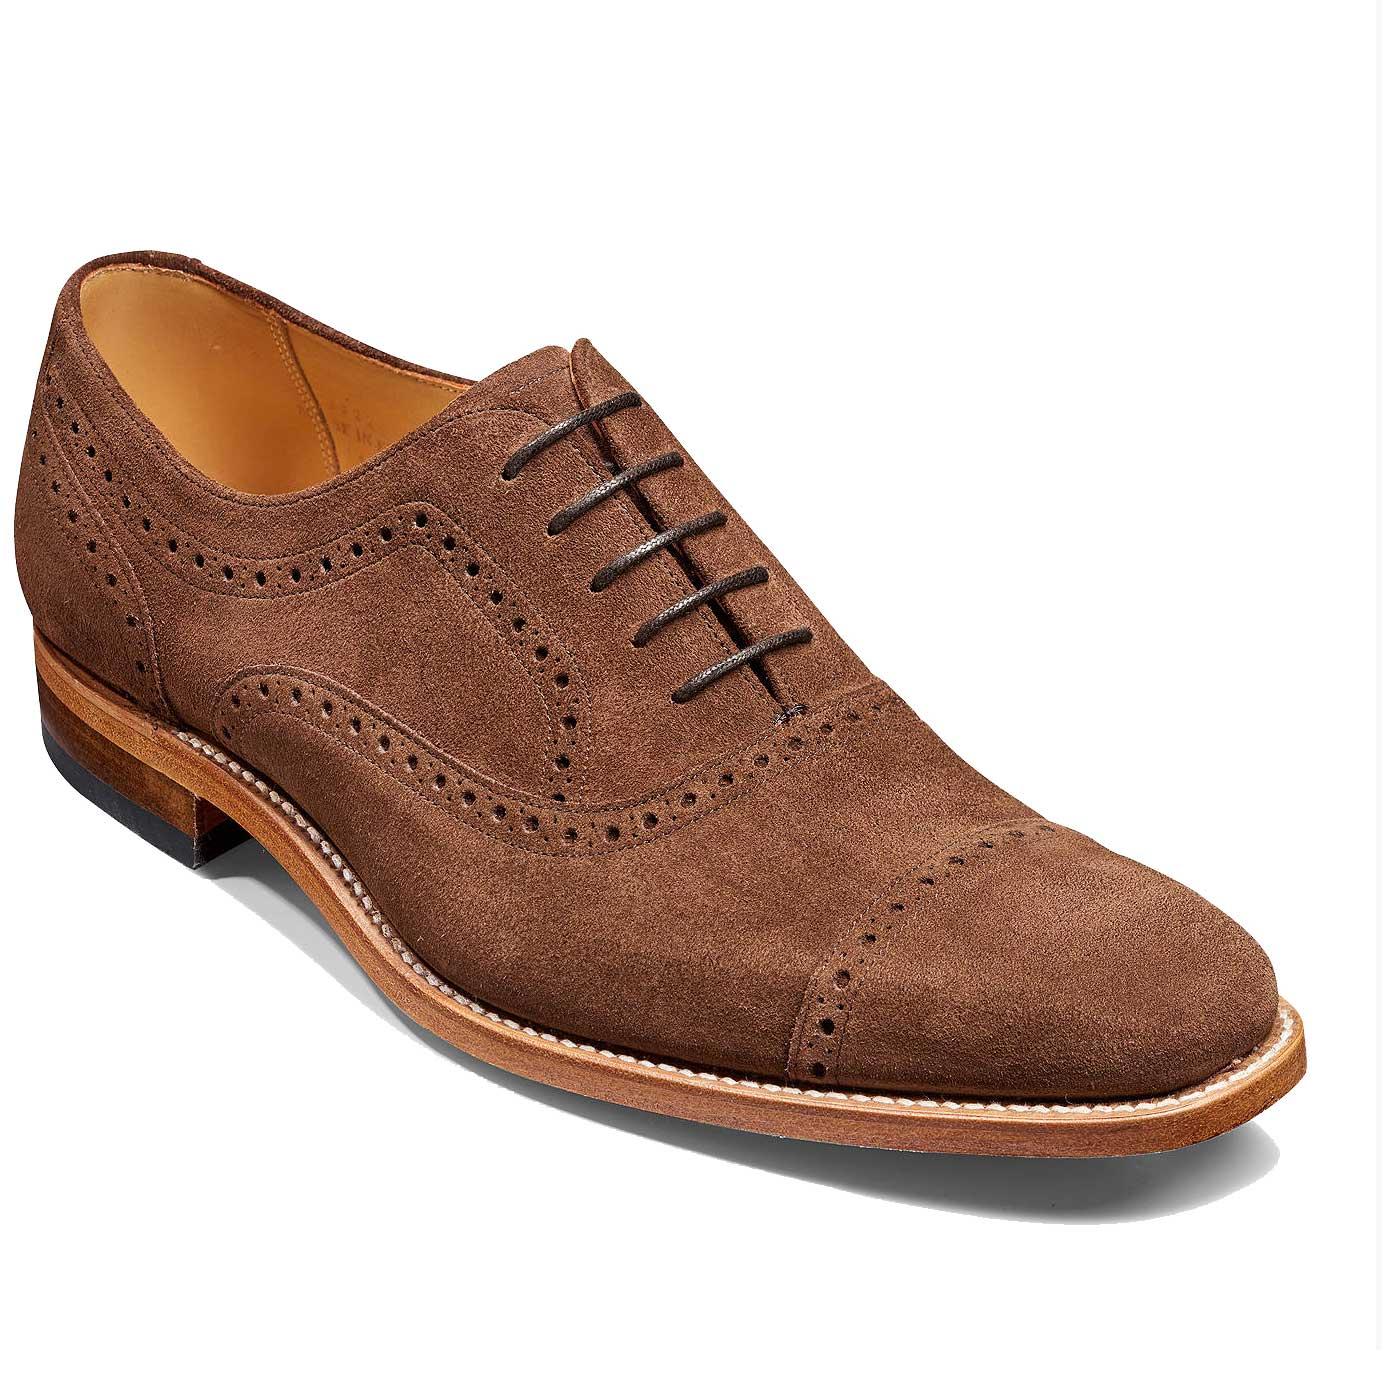 BARKER Luke Shoes - Mens Semi Brogues